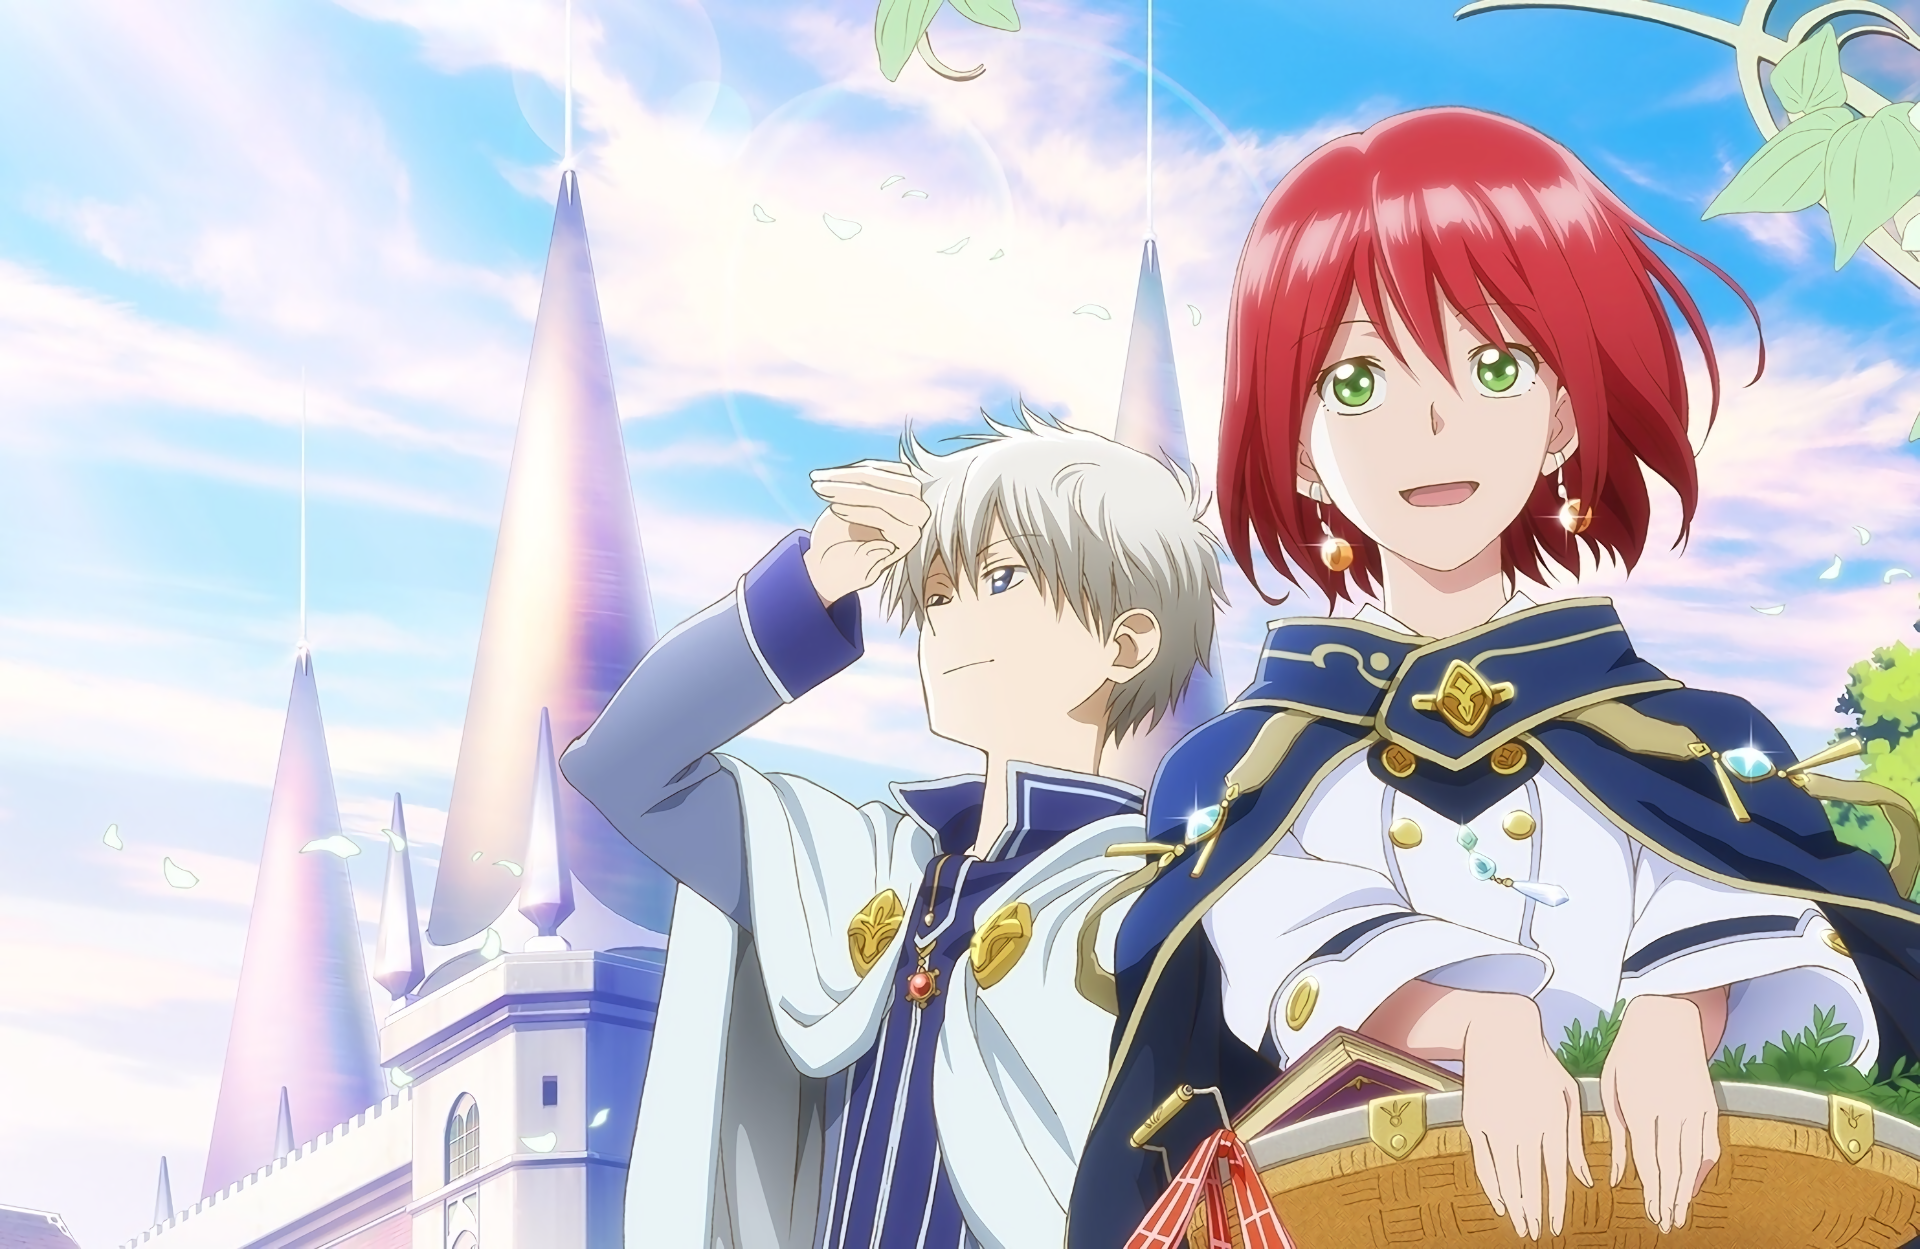 Anime Akagami No Shirayuki Hime Shirayuki Snow White With The Red Hair Zen Wistalia Clarines Akagami Snow White With The Red Hair Anime Snow Red Hair Images